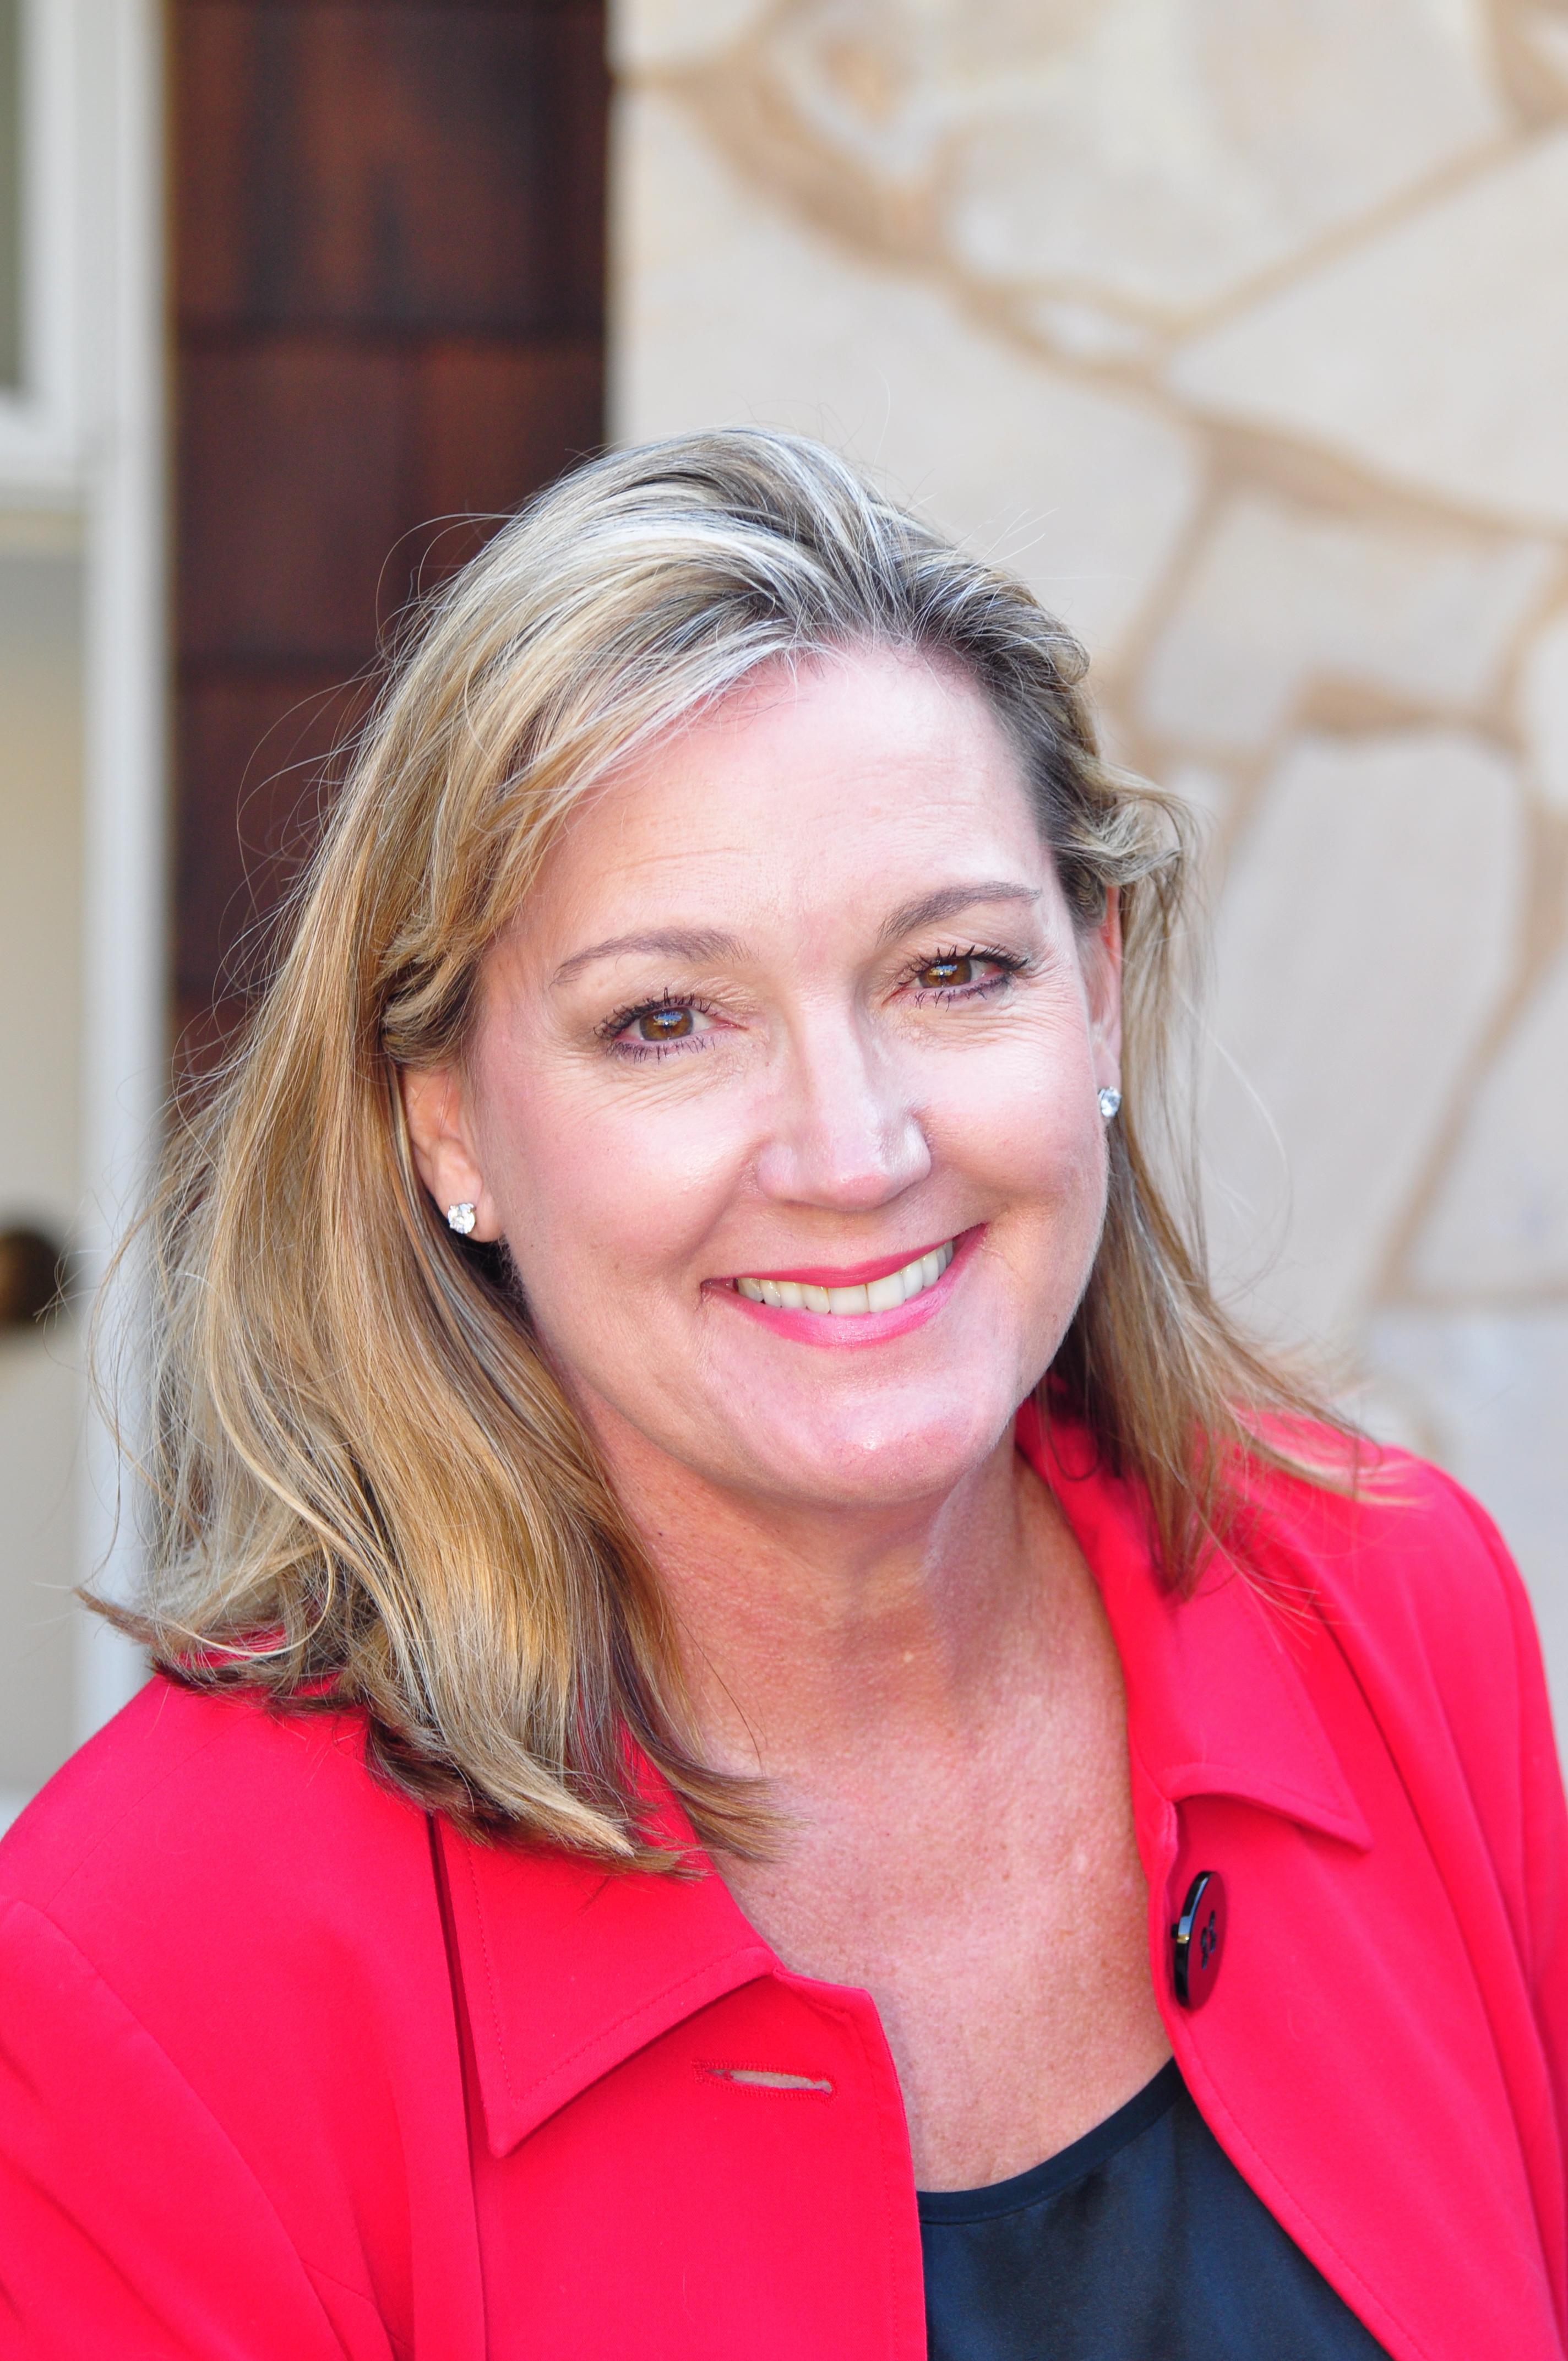 Julie Ritchie Hile